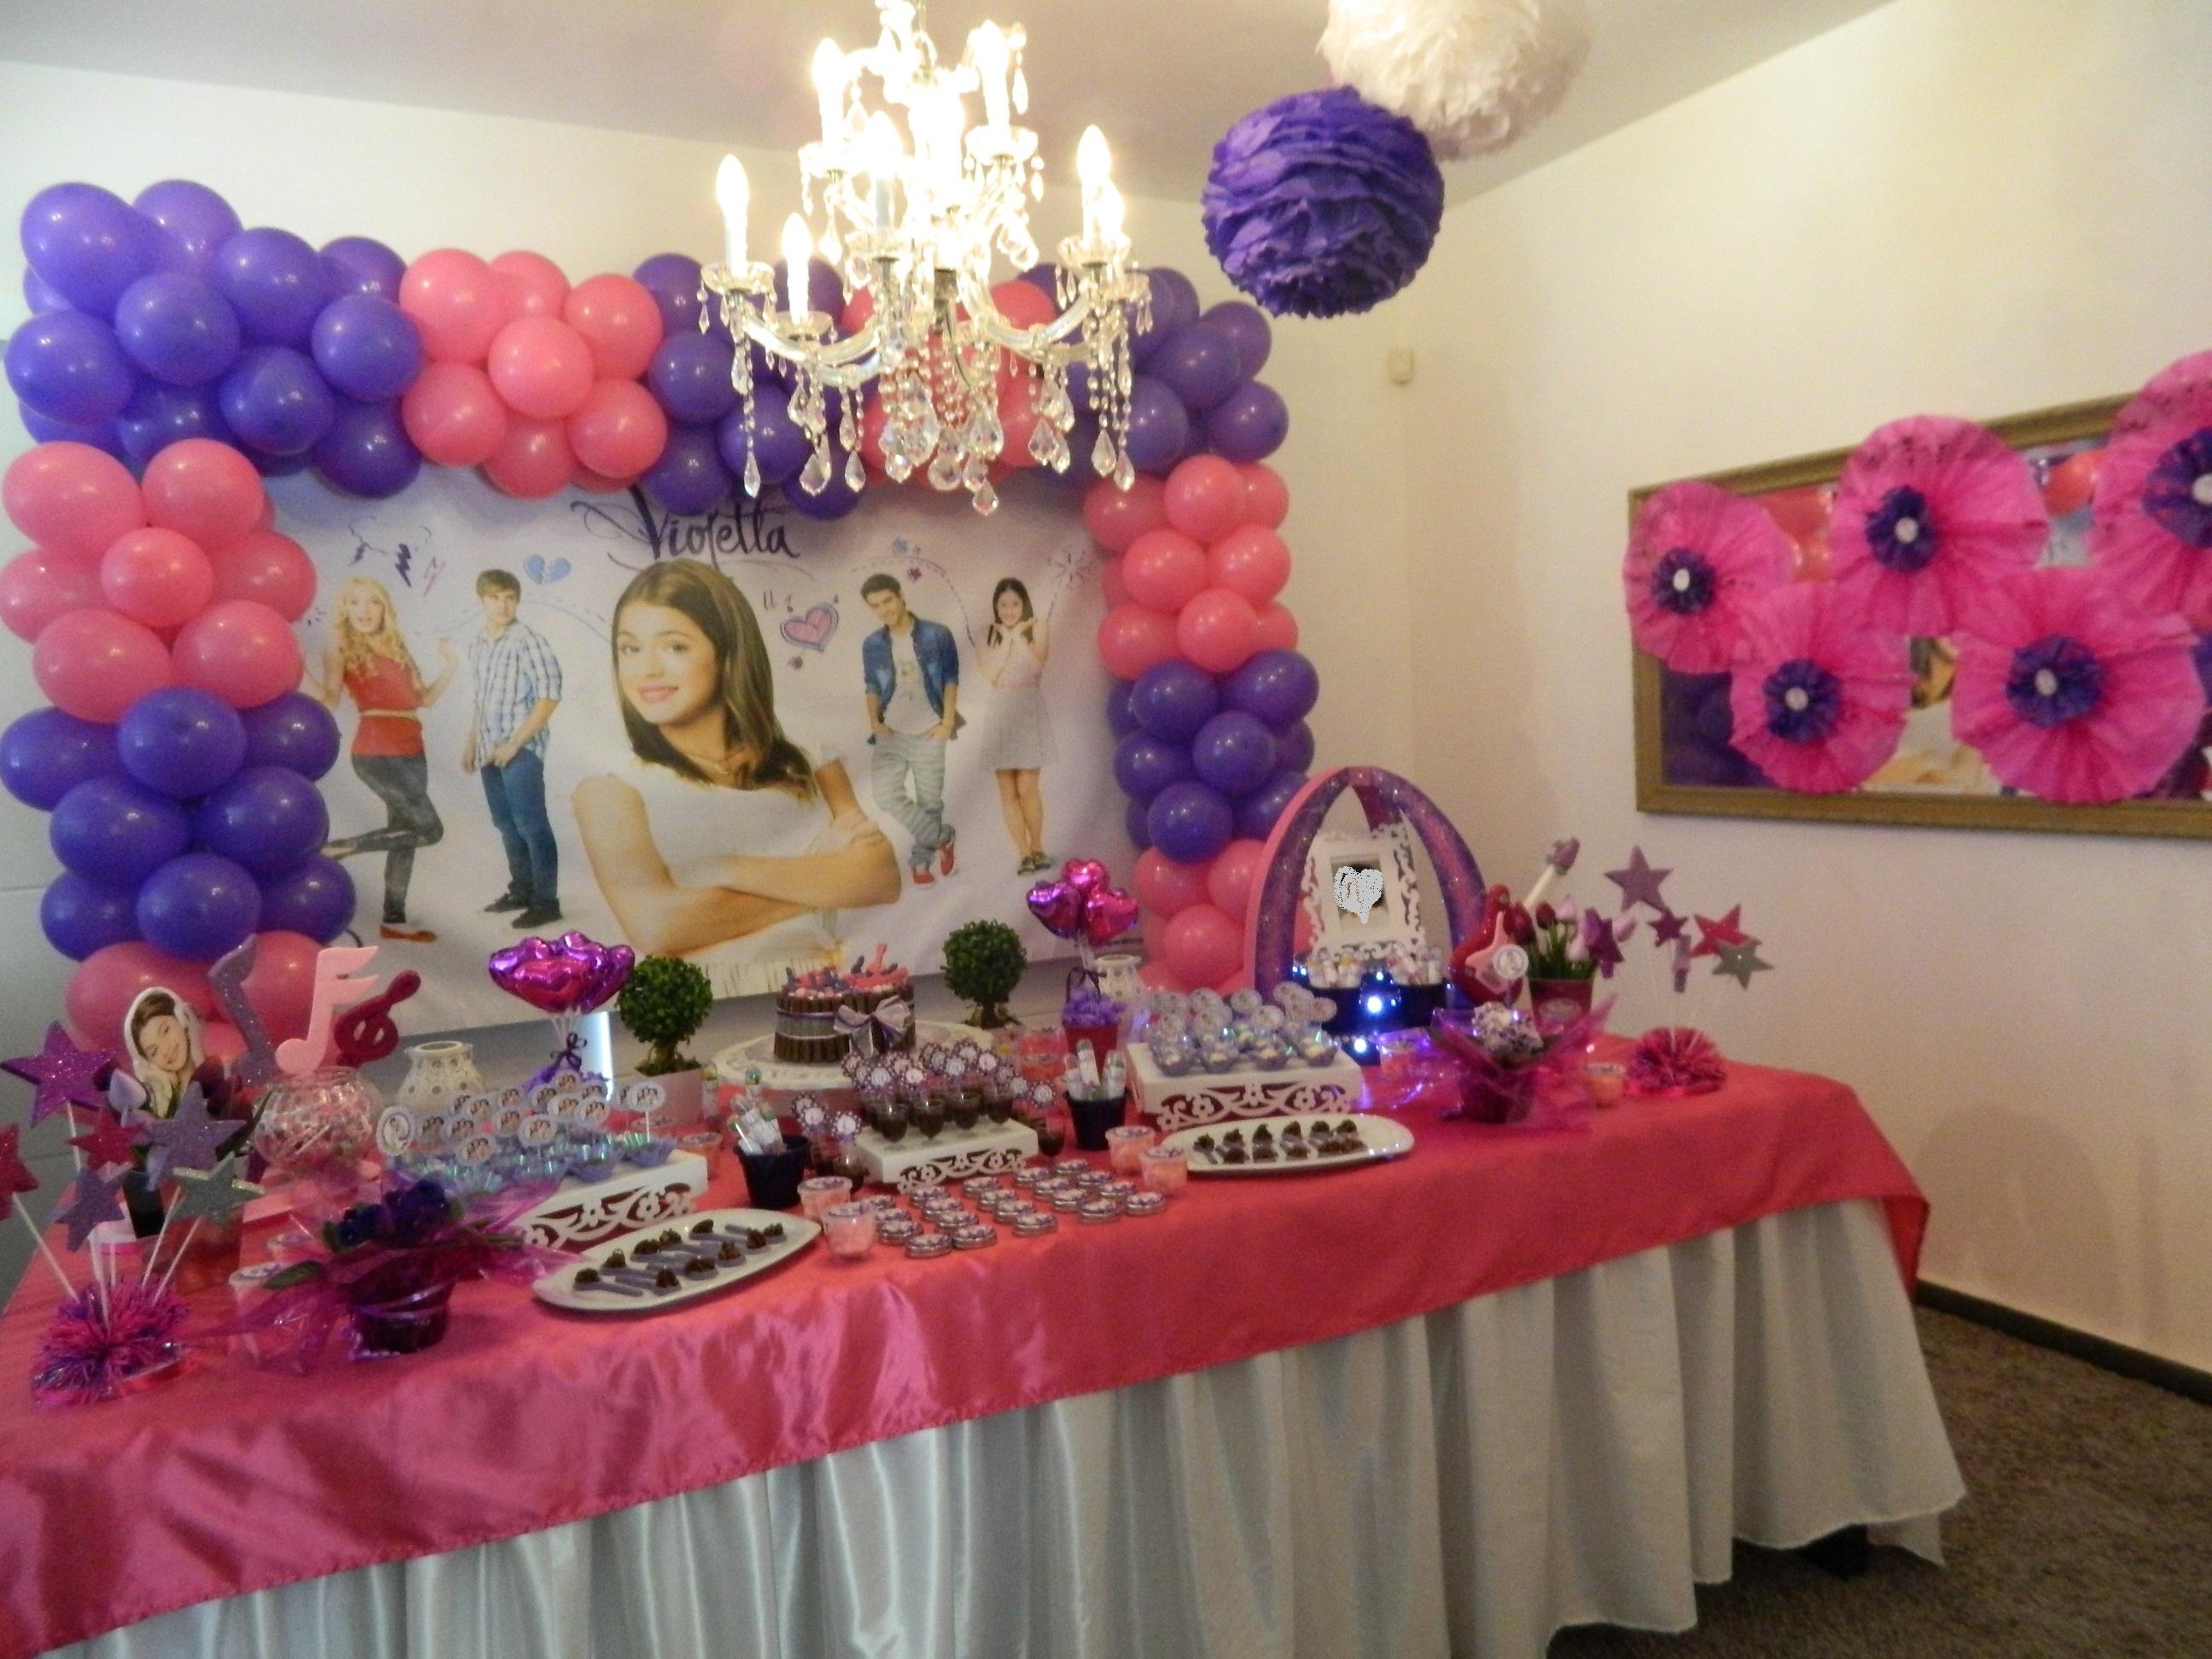 decoracao festa violeta: decoracao violetta decoracao violetta disney festa violetta decoracao